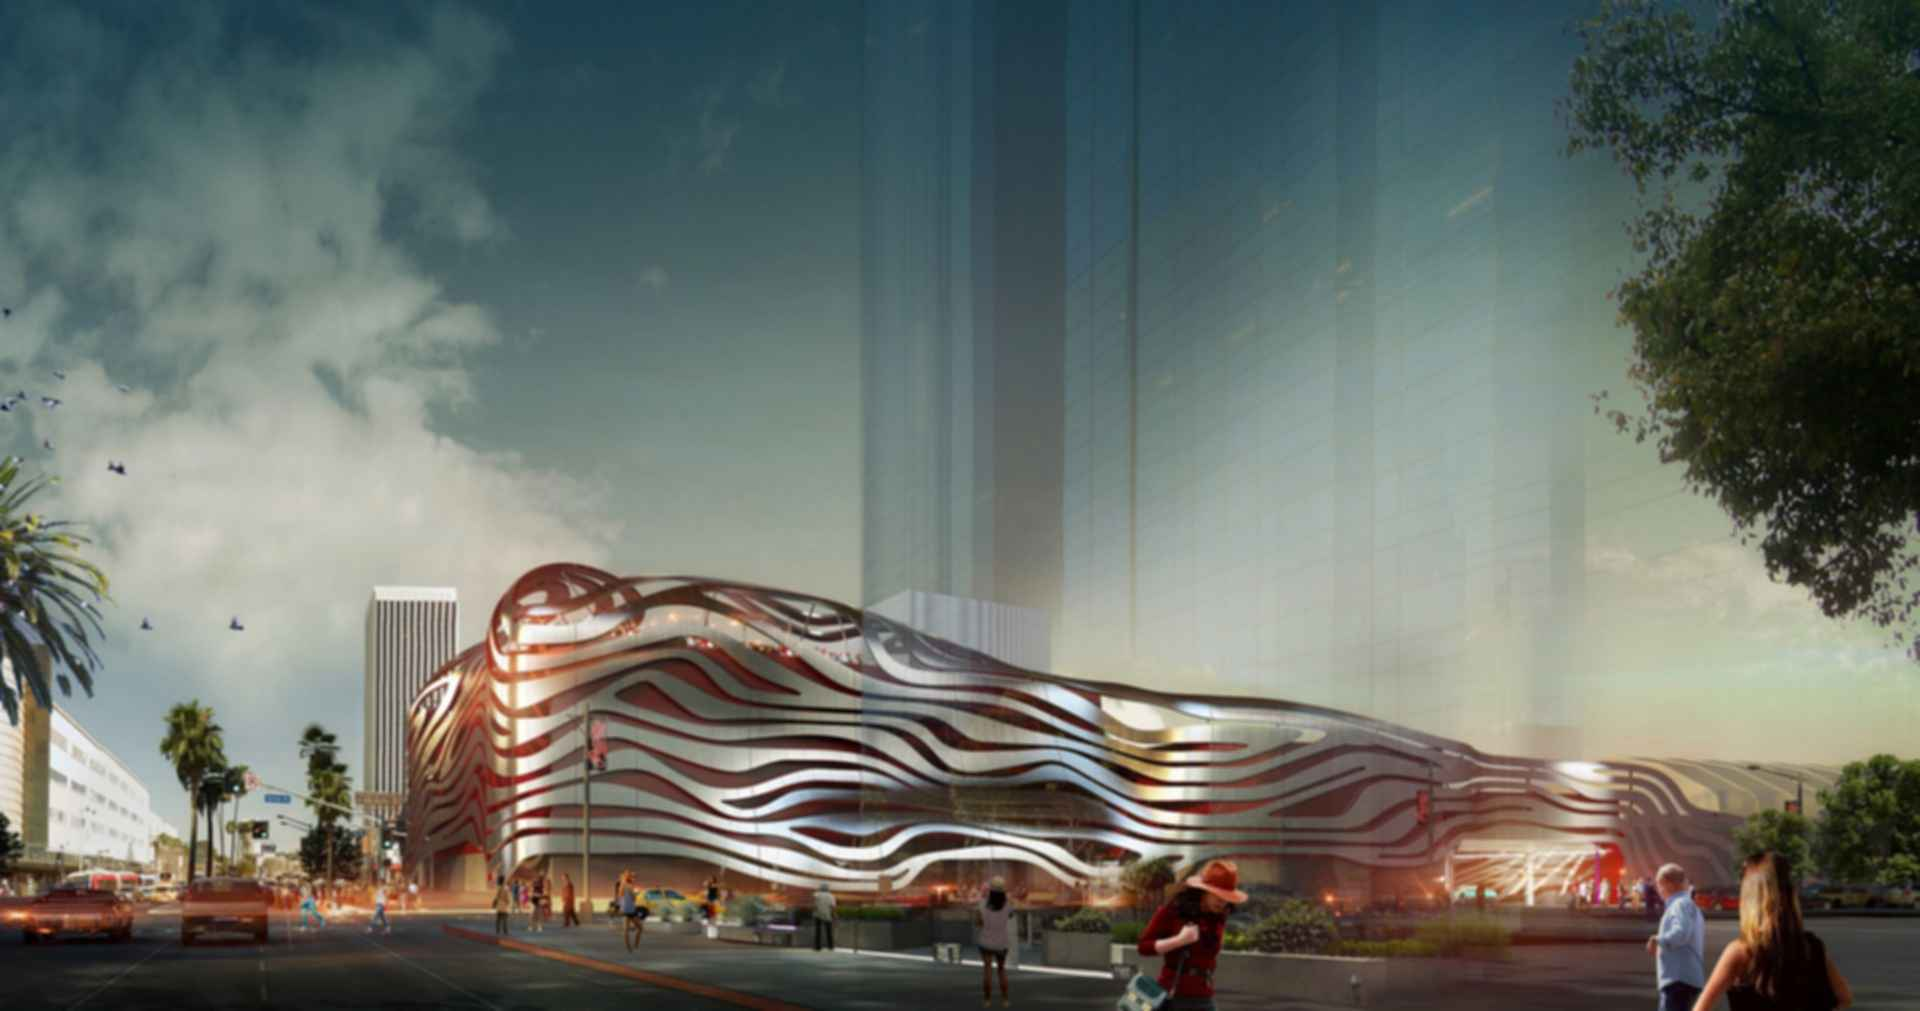 Petersen Automotive Museum - Concept Design